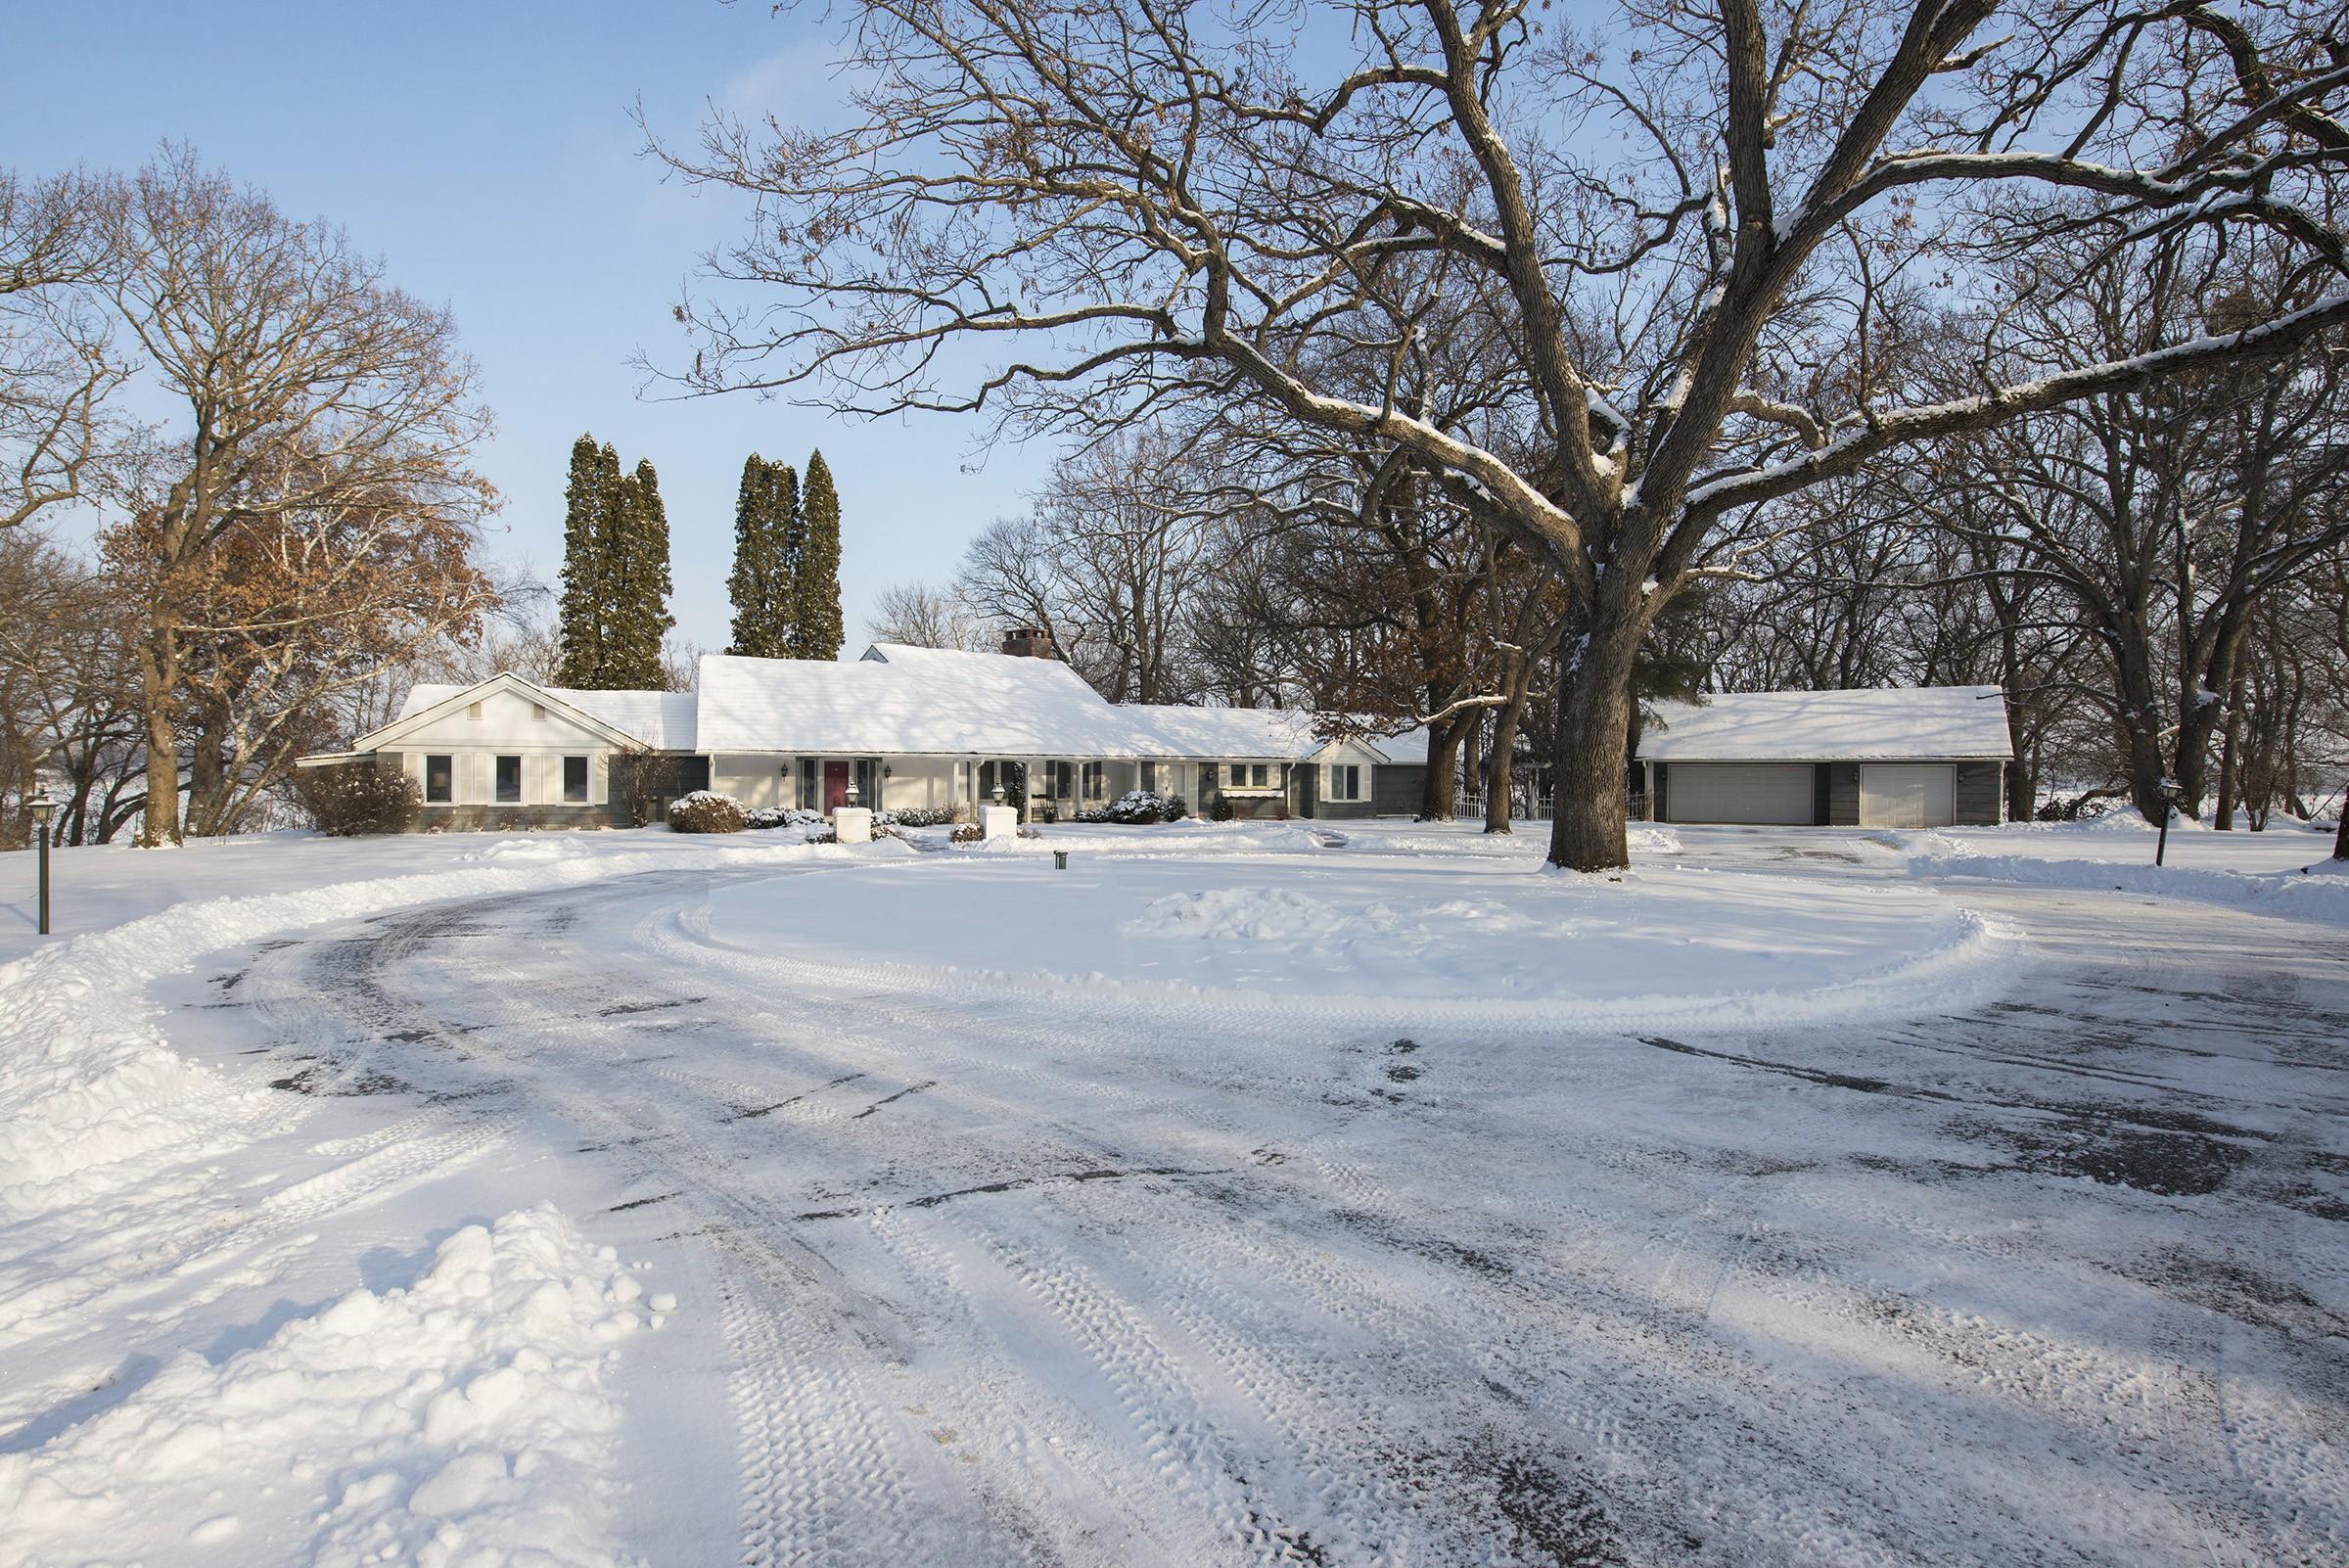 Property For Sale at Landmark Lakeshore Estate Property on Pleasant Lake